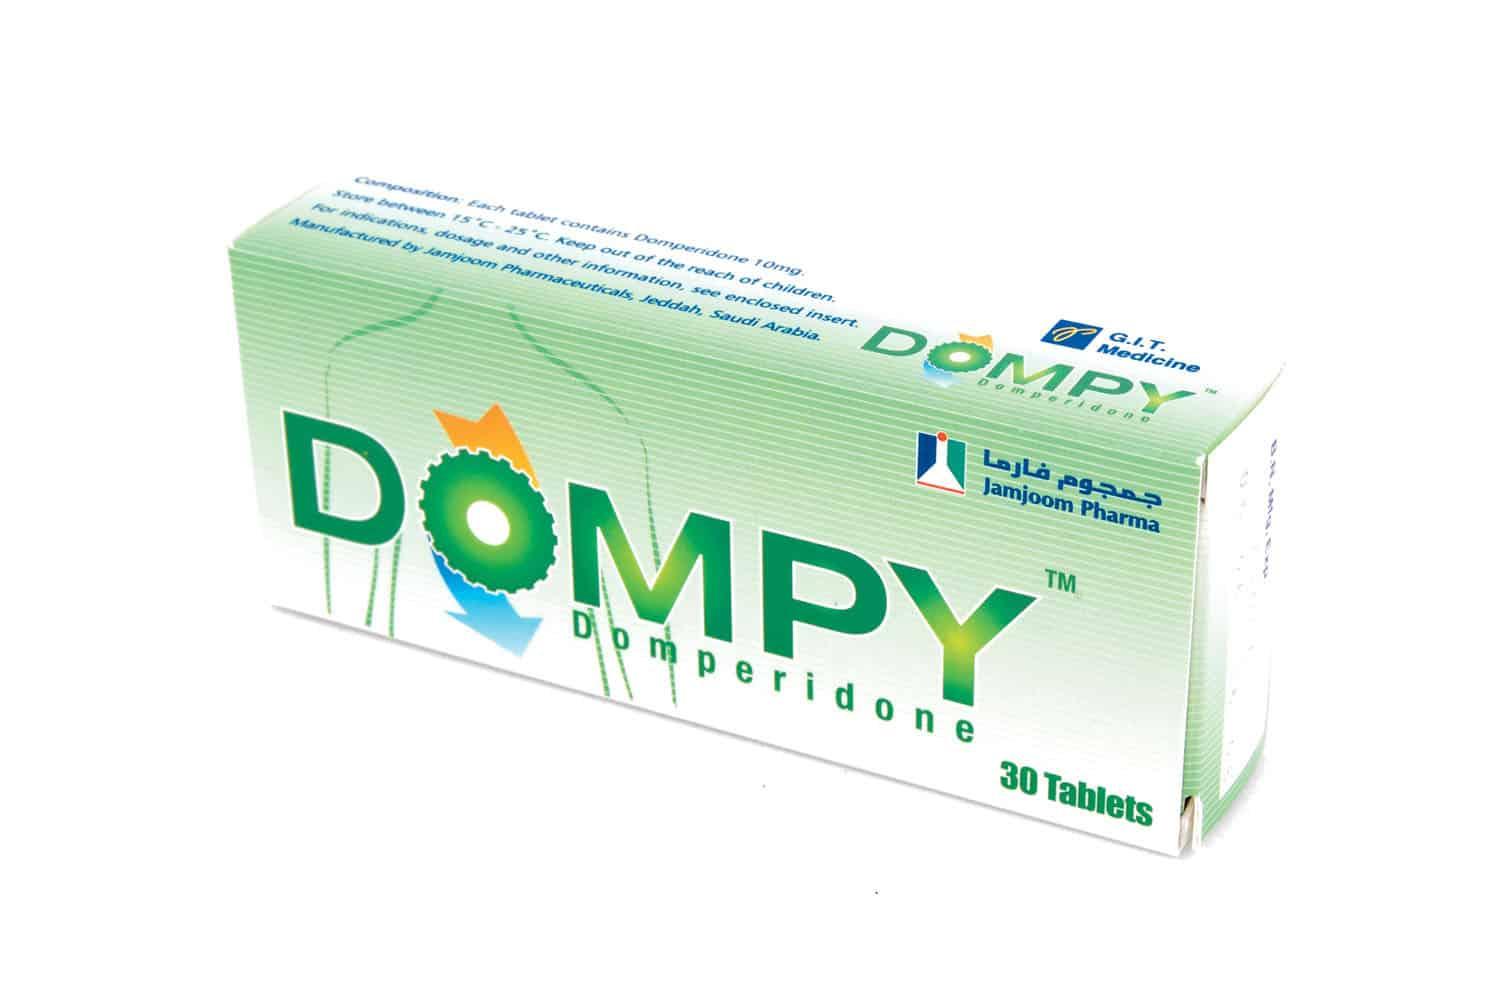 Dompy